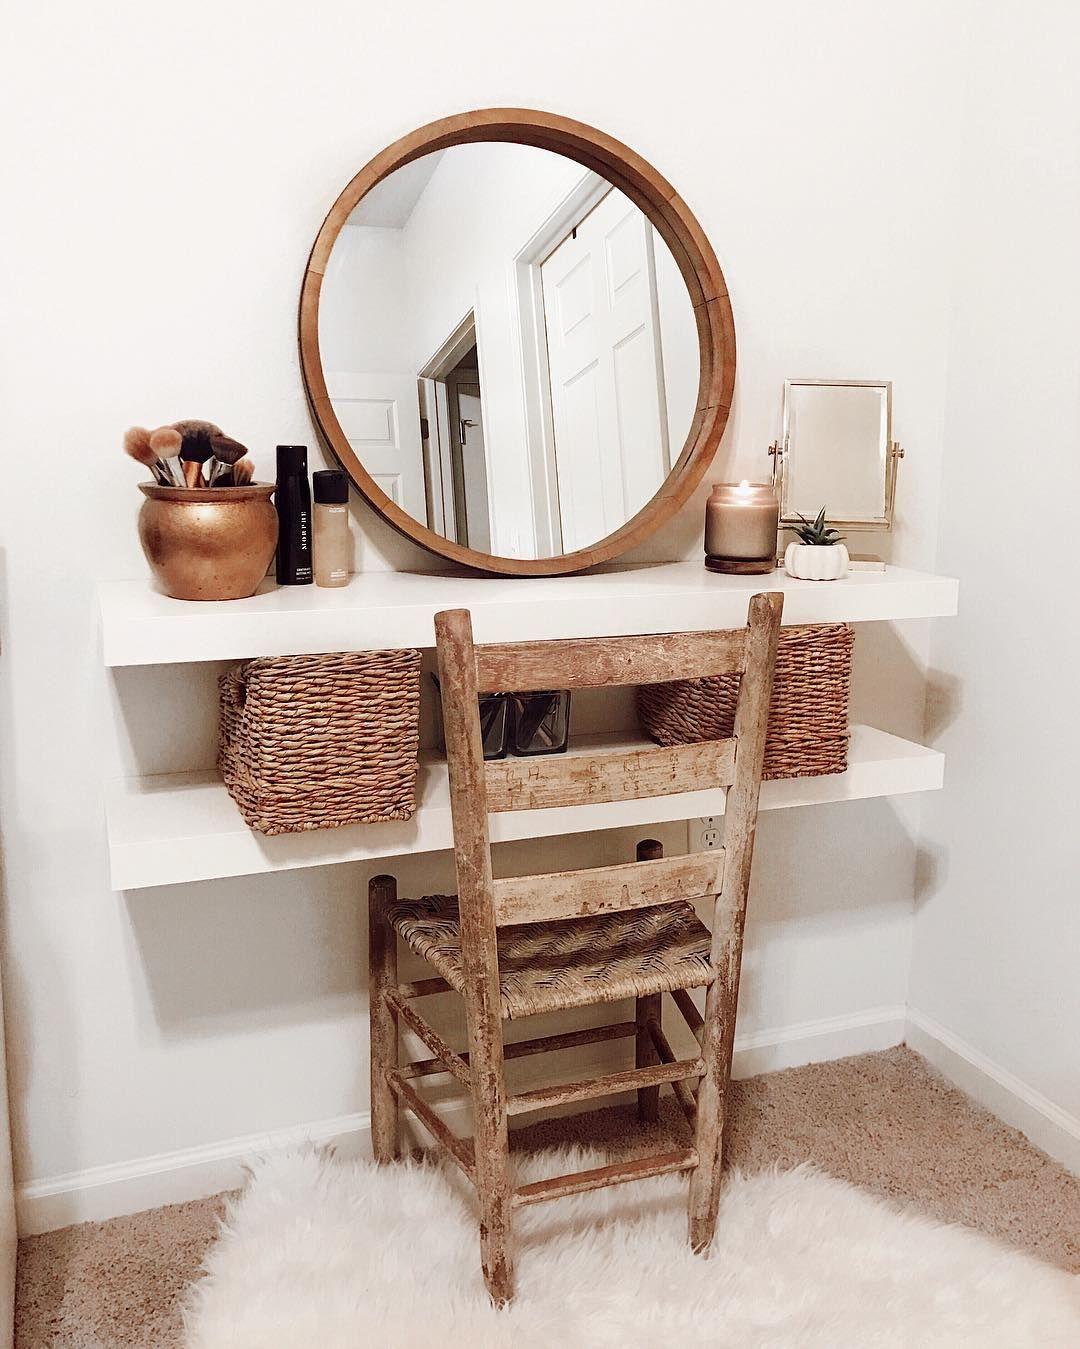 Ikea Lack floating shelves vanity Vanity decor, Floating